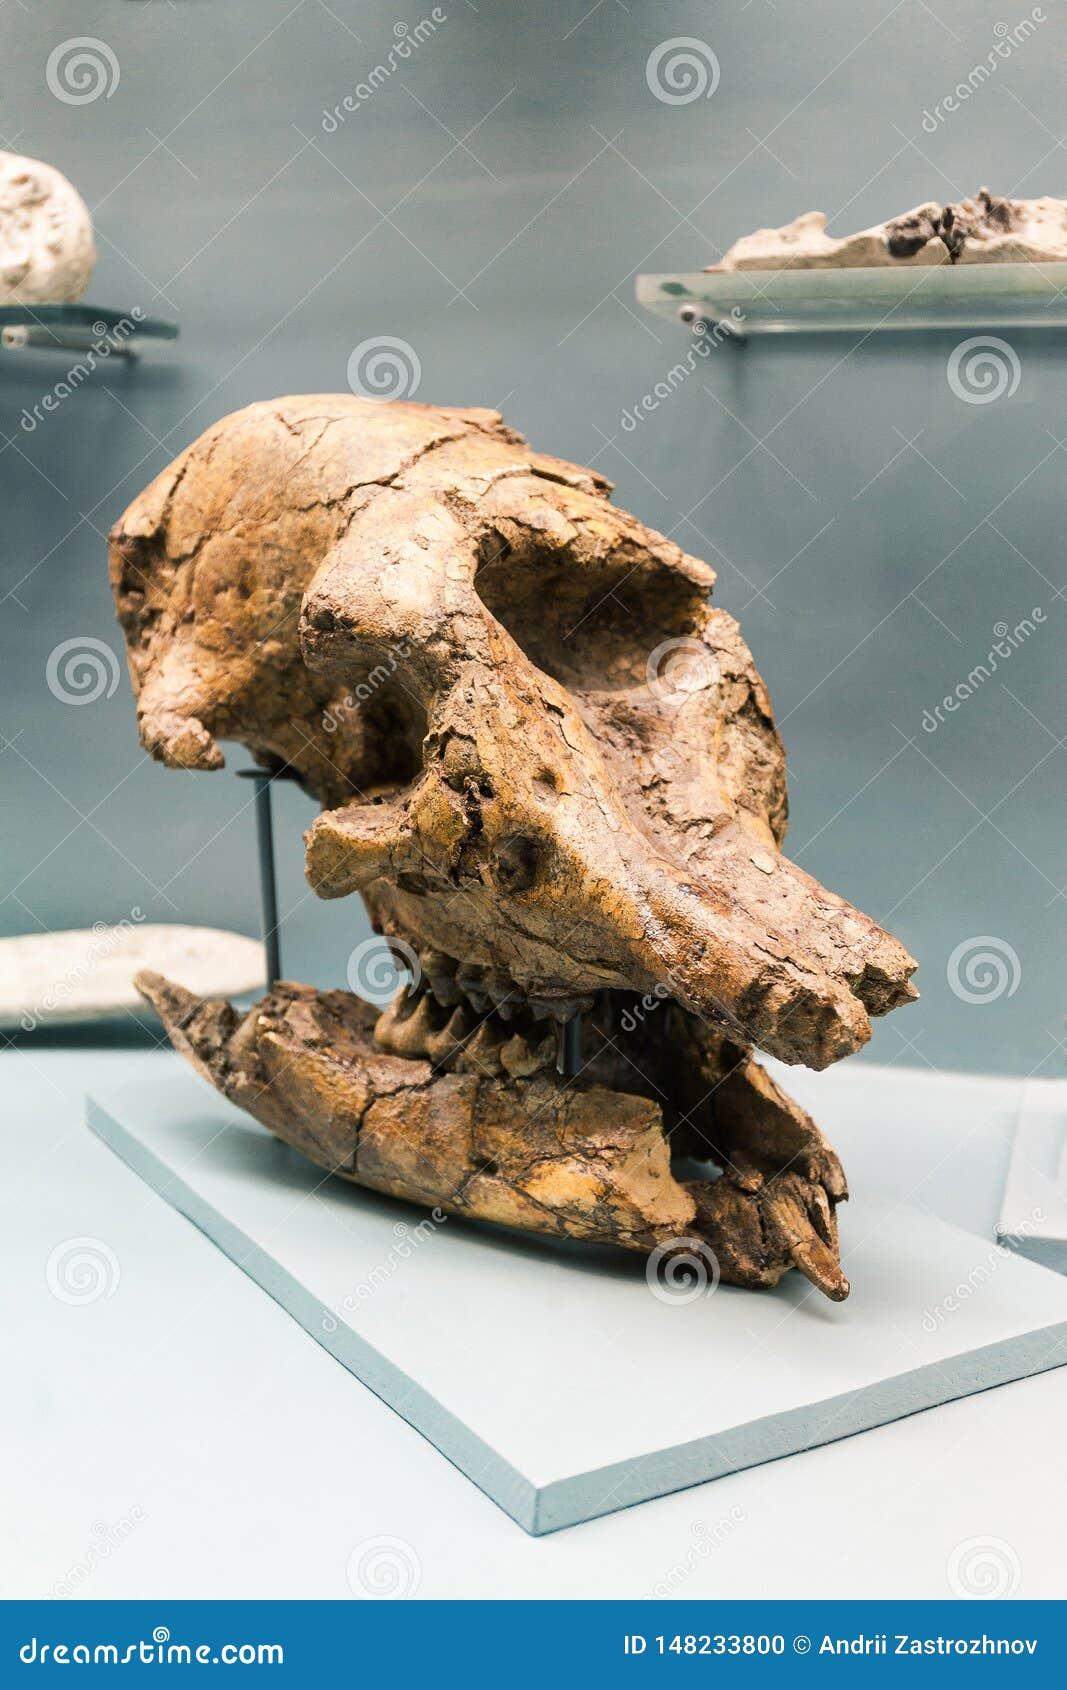 KYIV, ΟΥΚΡΑΝΊΑ - 16 ΙΟΥΝΊΟΥ 2018: Εθνικό Μουσείο των φυσικών επιστημών της Ουκρανίας Απολιθωμένο κρανίο, σκελετός δεινοσαύρων Γίγ